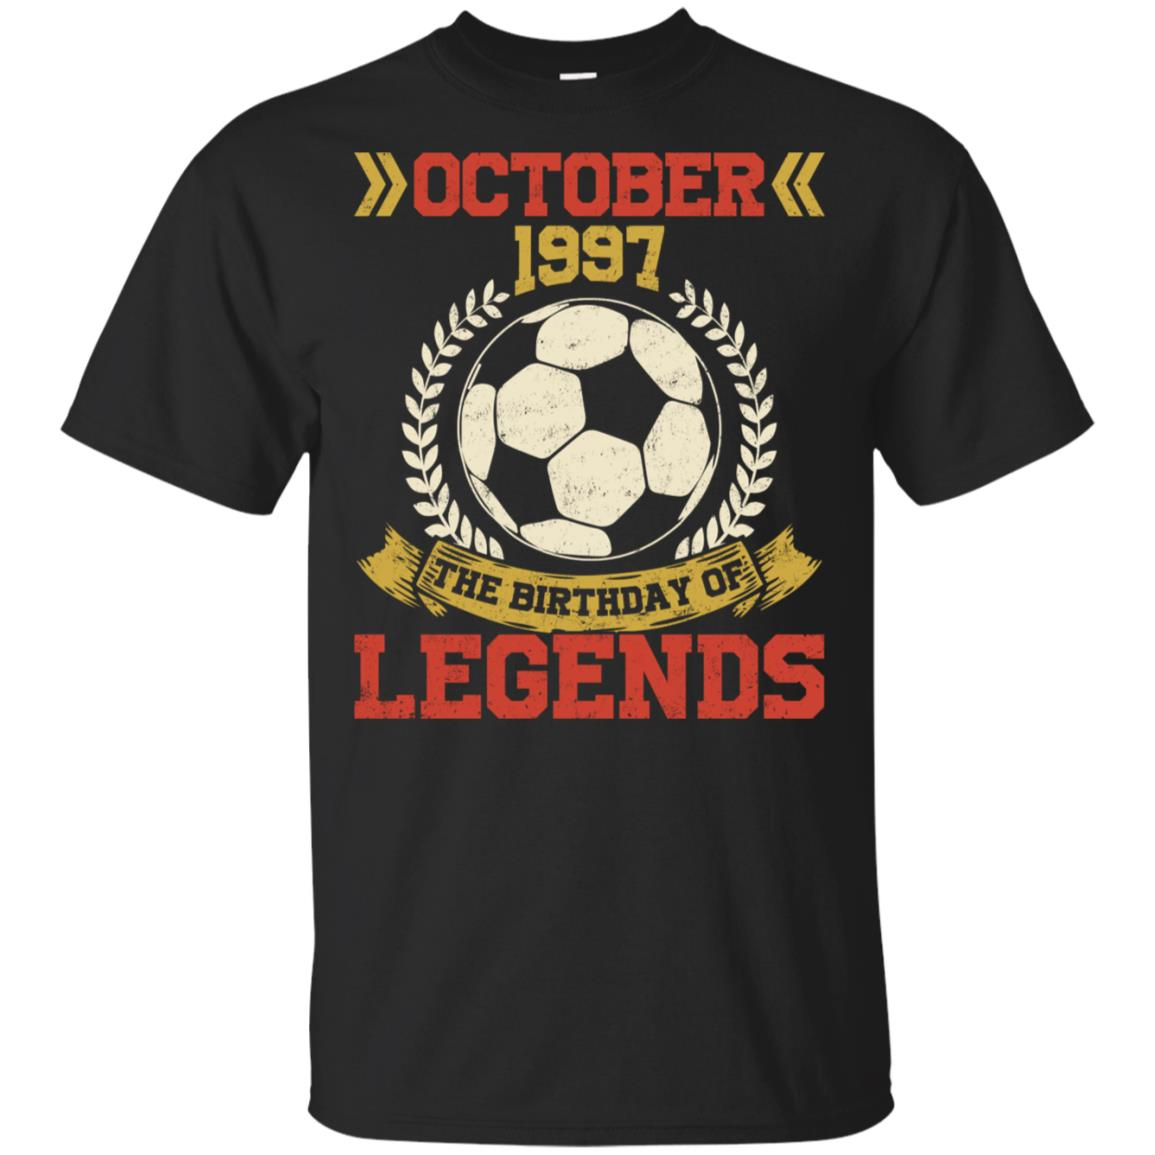 1997 October 21st Birthday Of Football Soccer Legend Unisex Short Sleeve